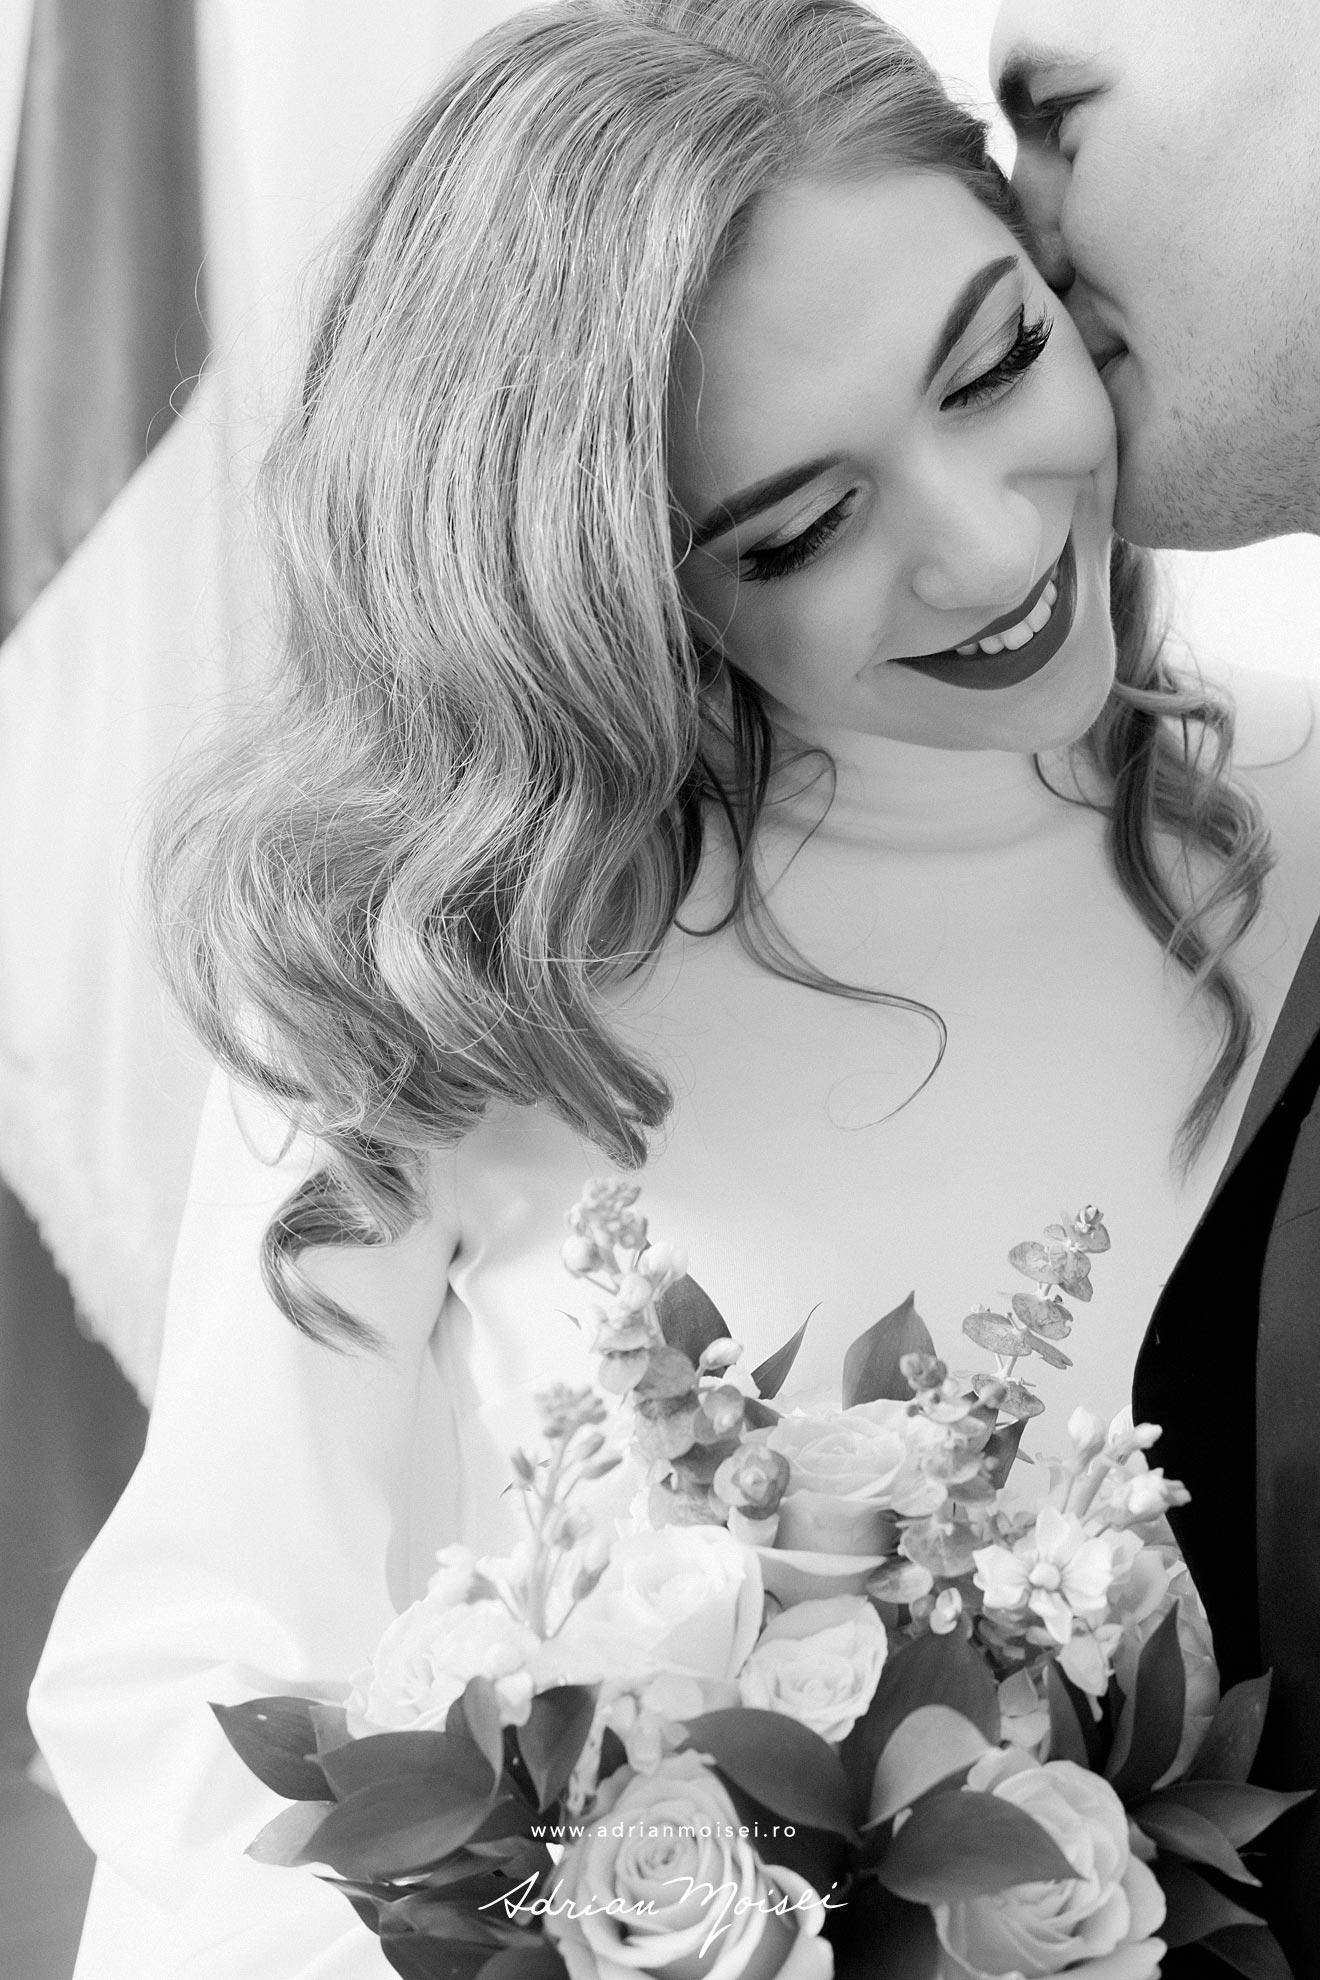 Fotograf nunta Iasi - filmmaker nunta Iasi - filmare cinematica Iasi fotograf Iasi, Adrian Moisei studio foto video